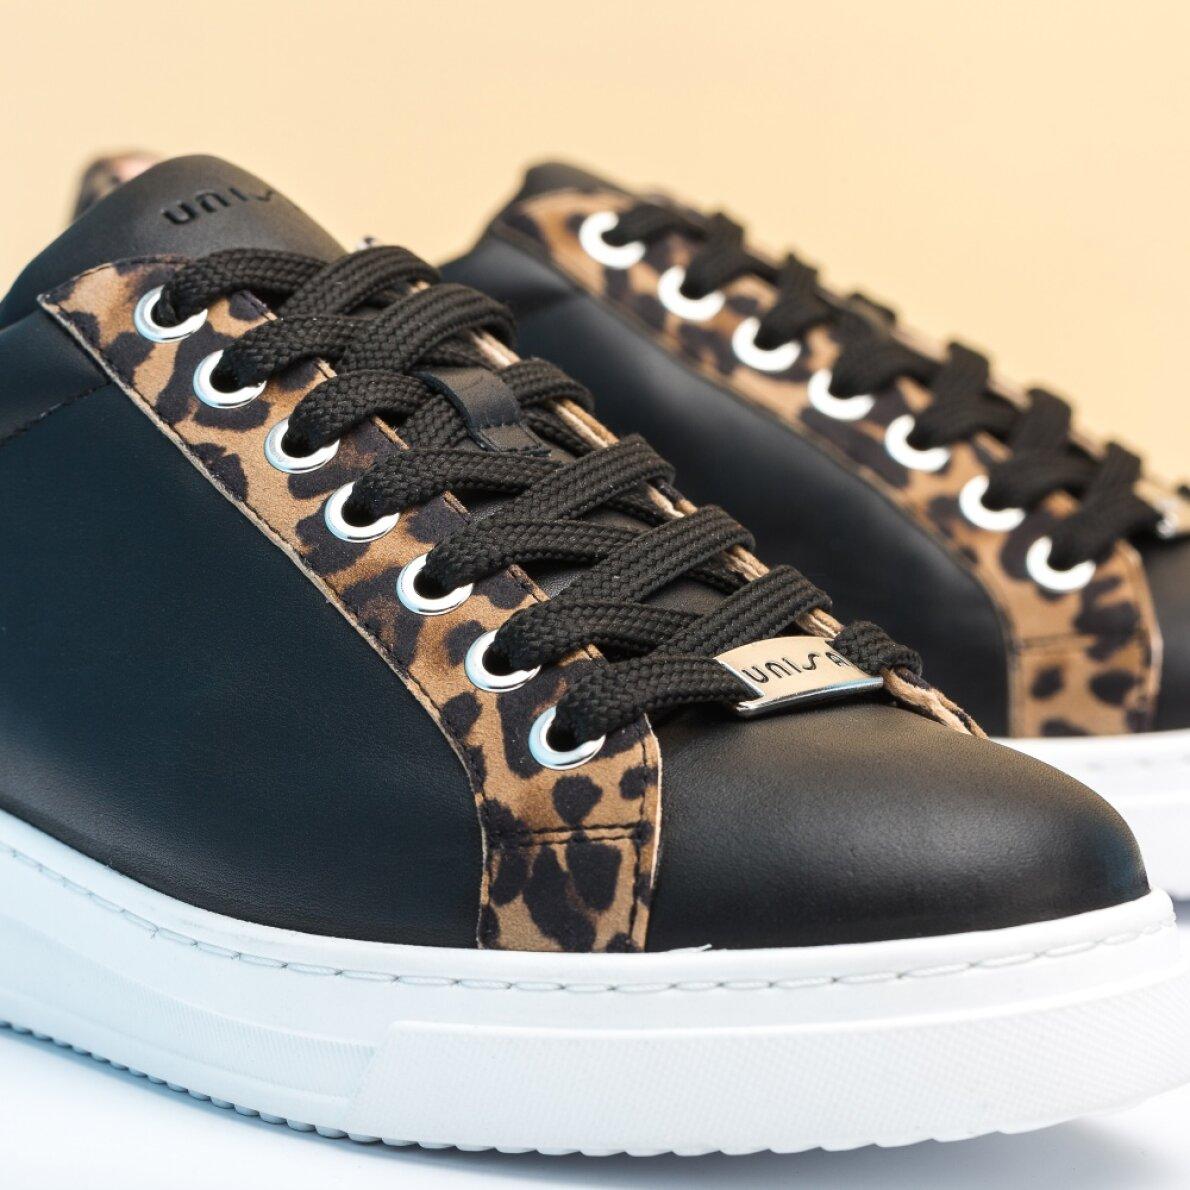 2d6e138d Unisa Franci - Sort dame sneaker med leopard print - Piedi.dk